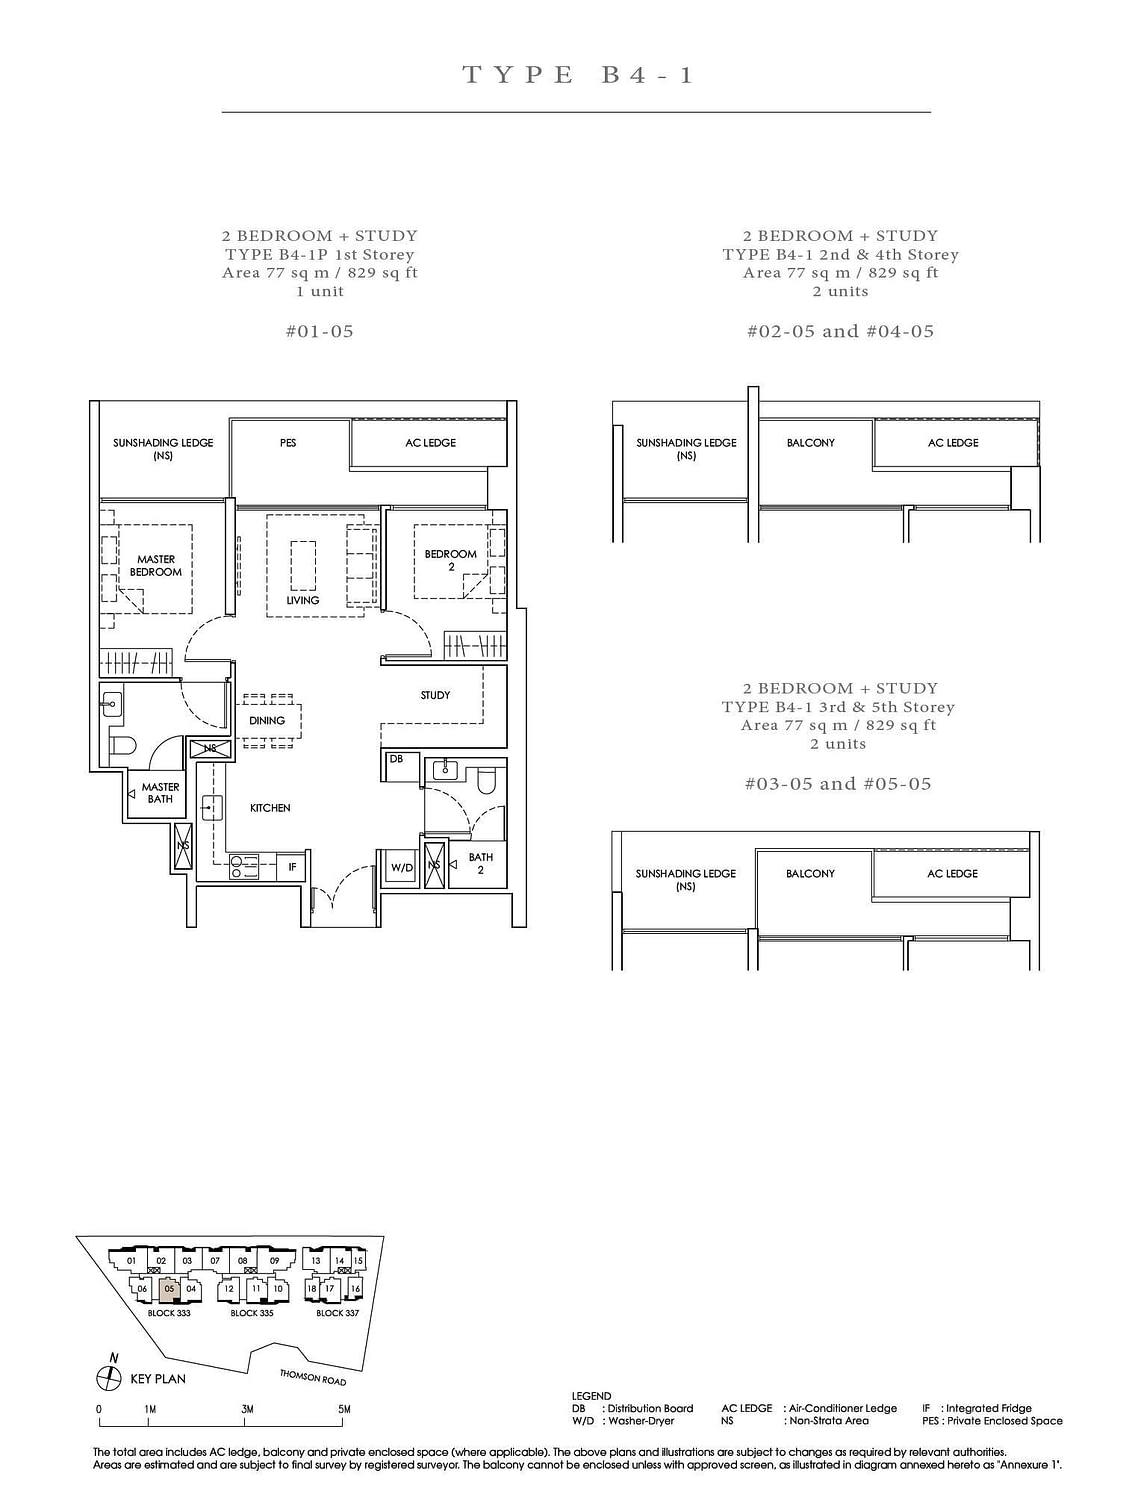 Peak Residence Peak Residence Floorplan B4 1P